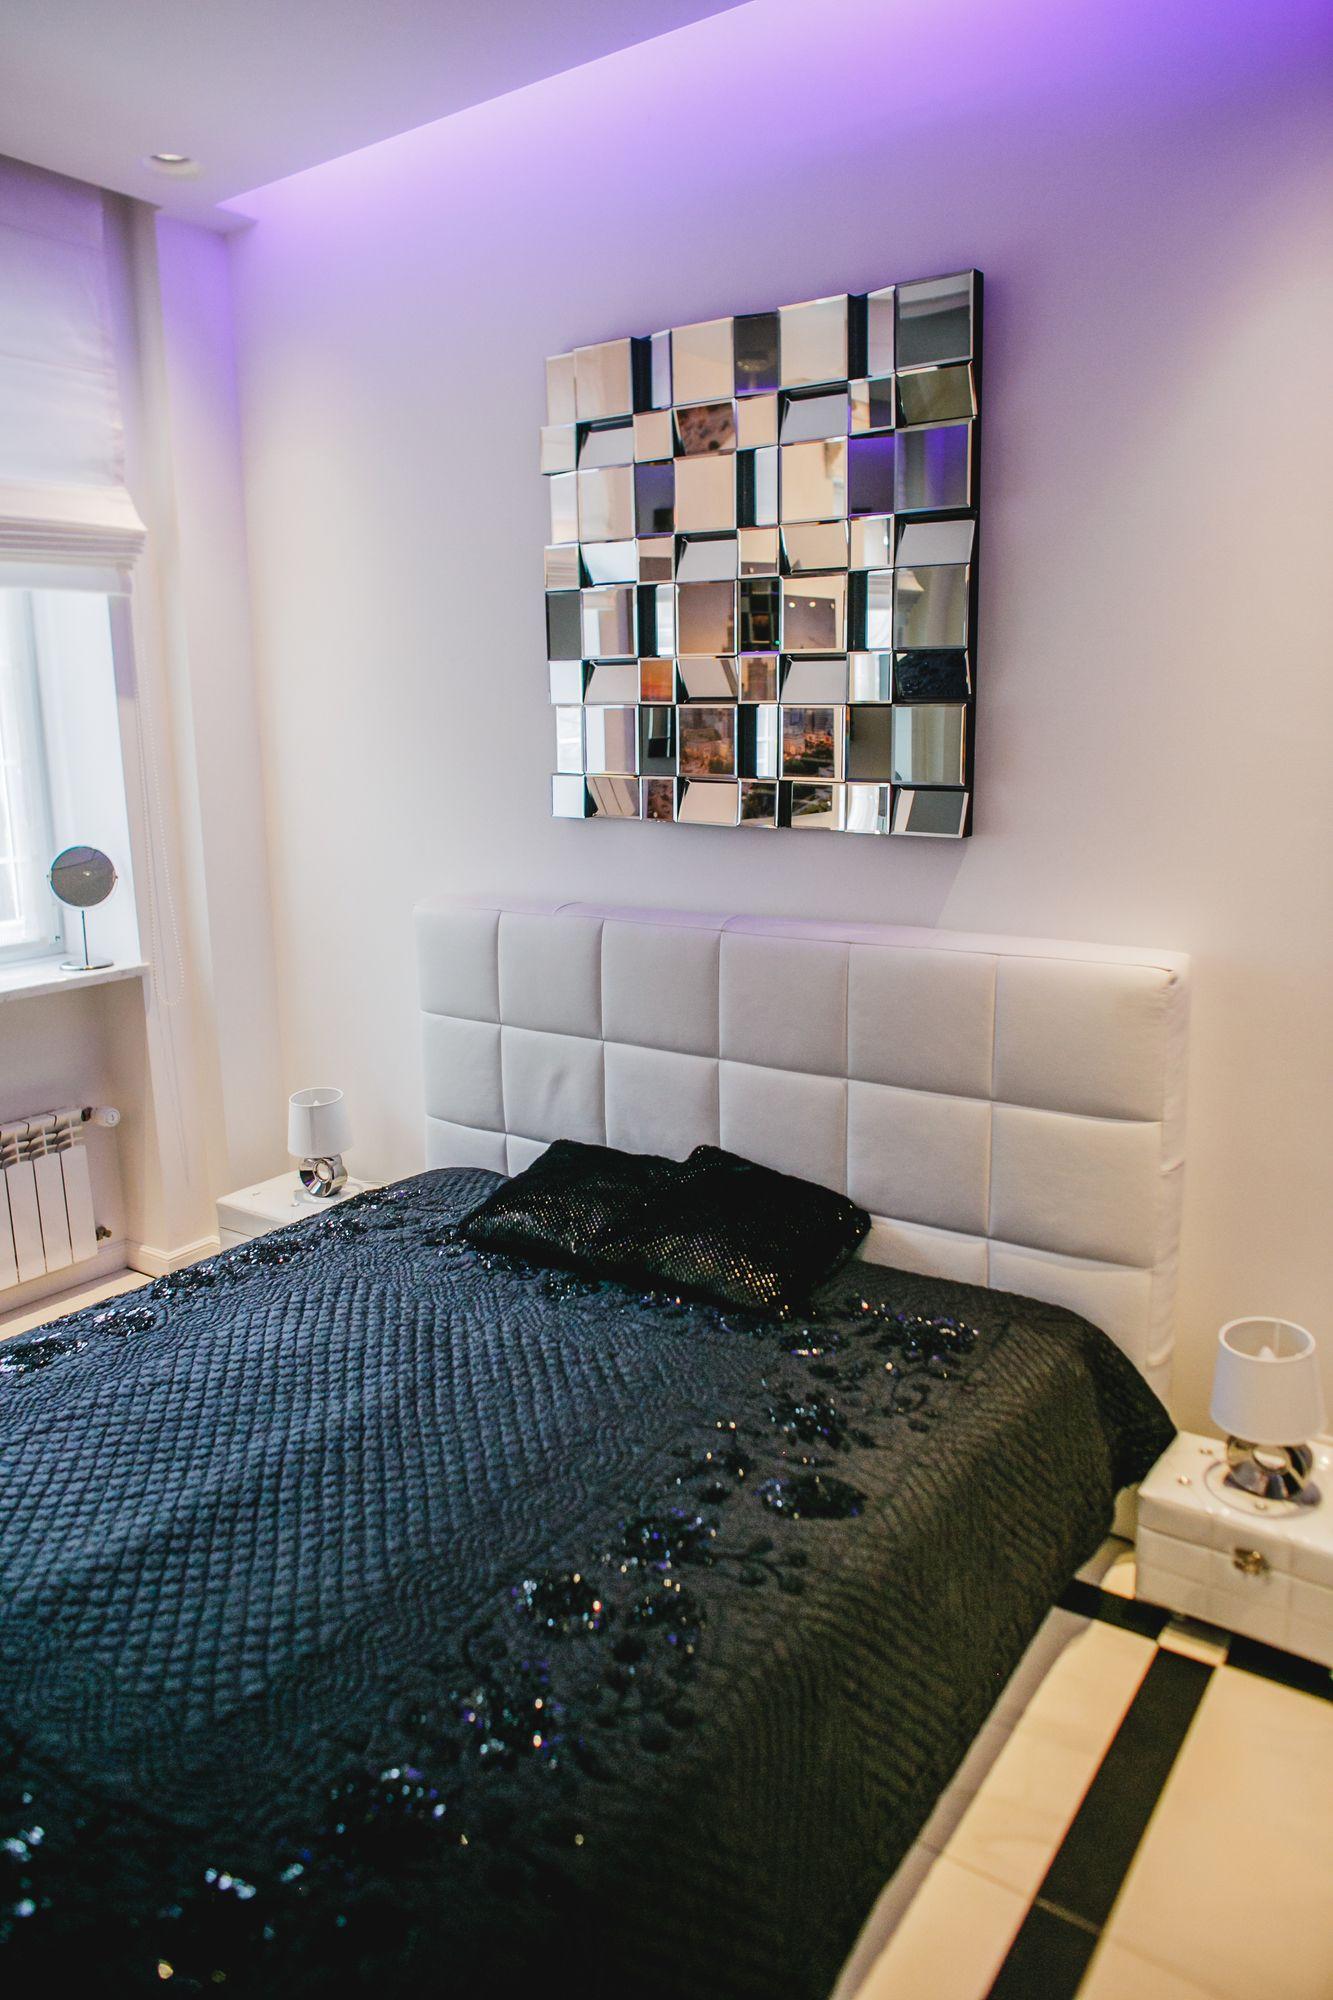 Marszalkowska 140 studio by Homeprime